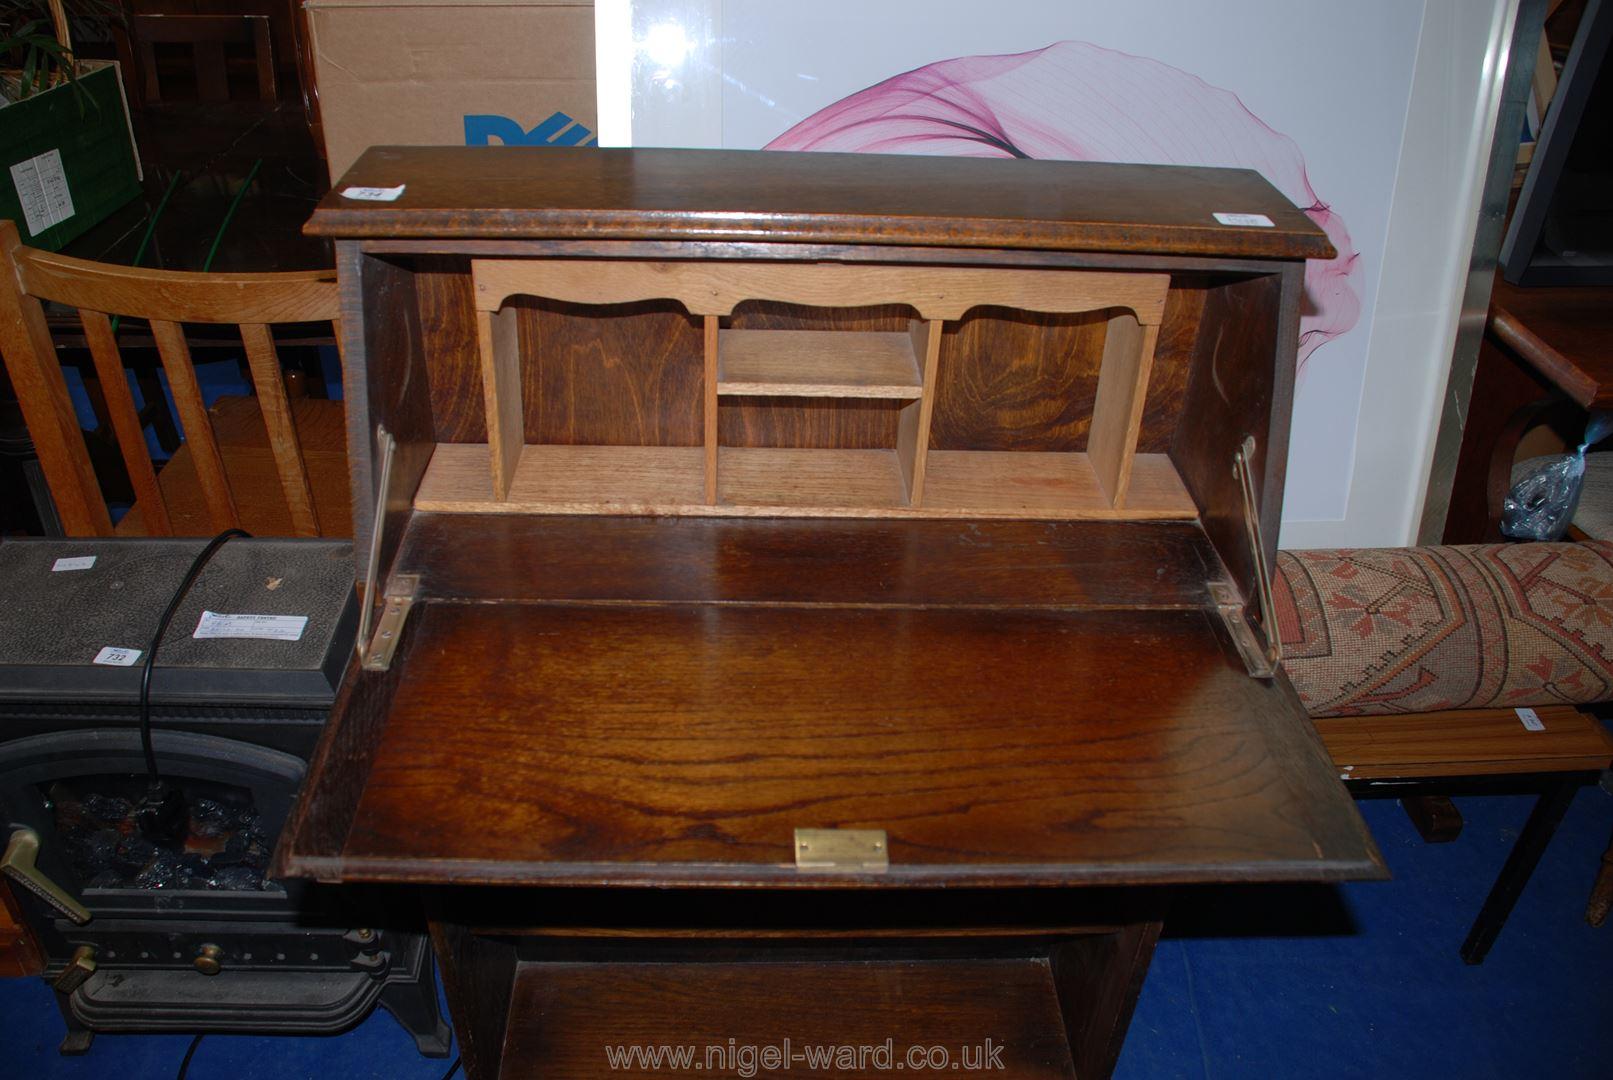 A Desk - Image 2 of 2